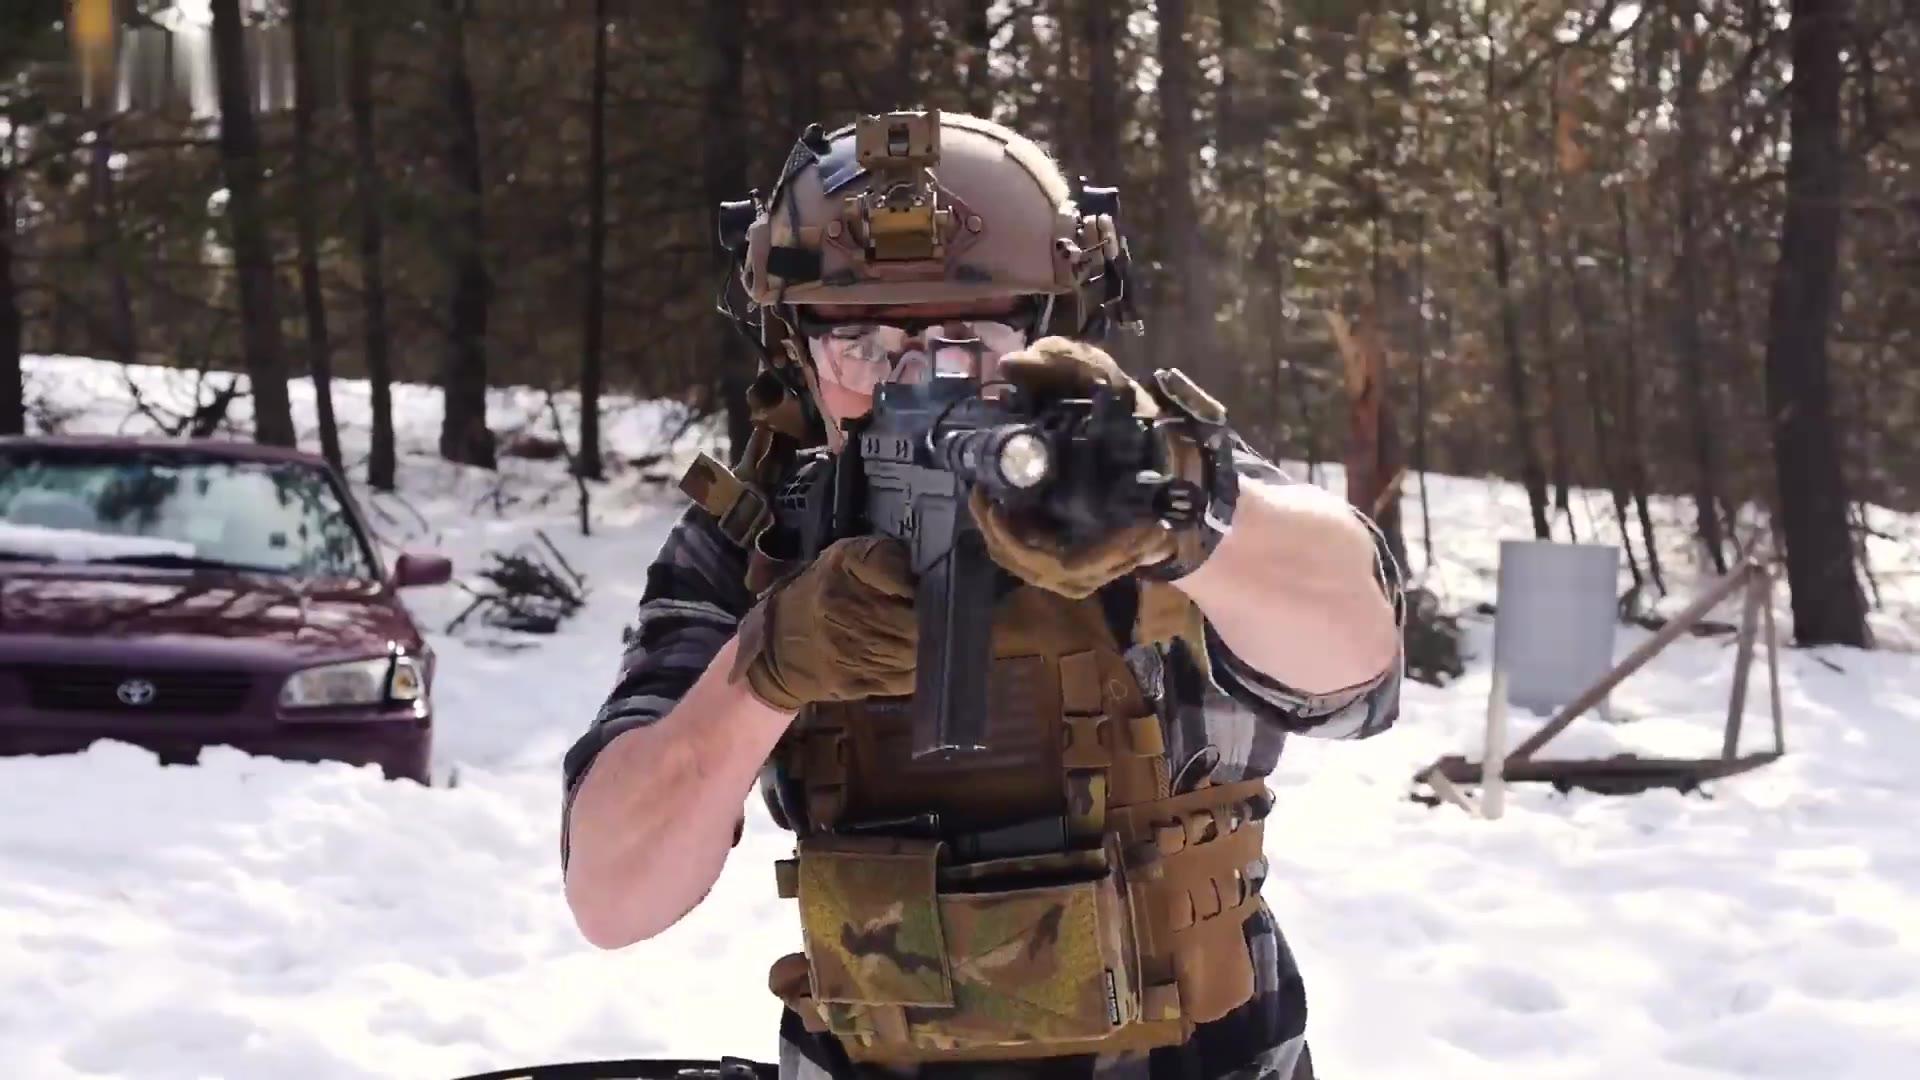 DSA SA58 OSW 射击训练